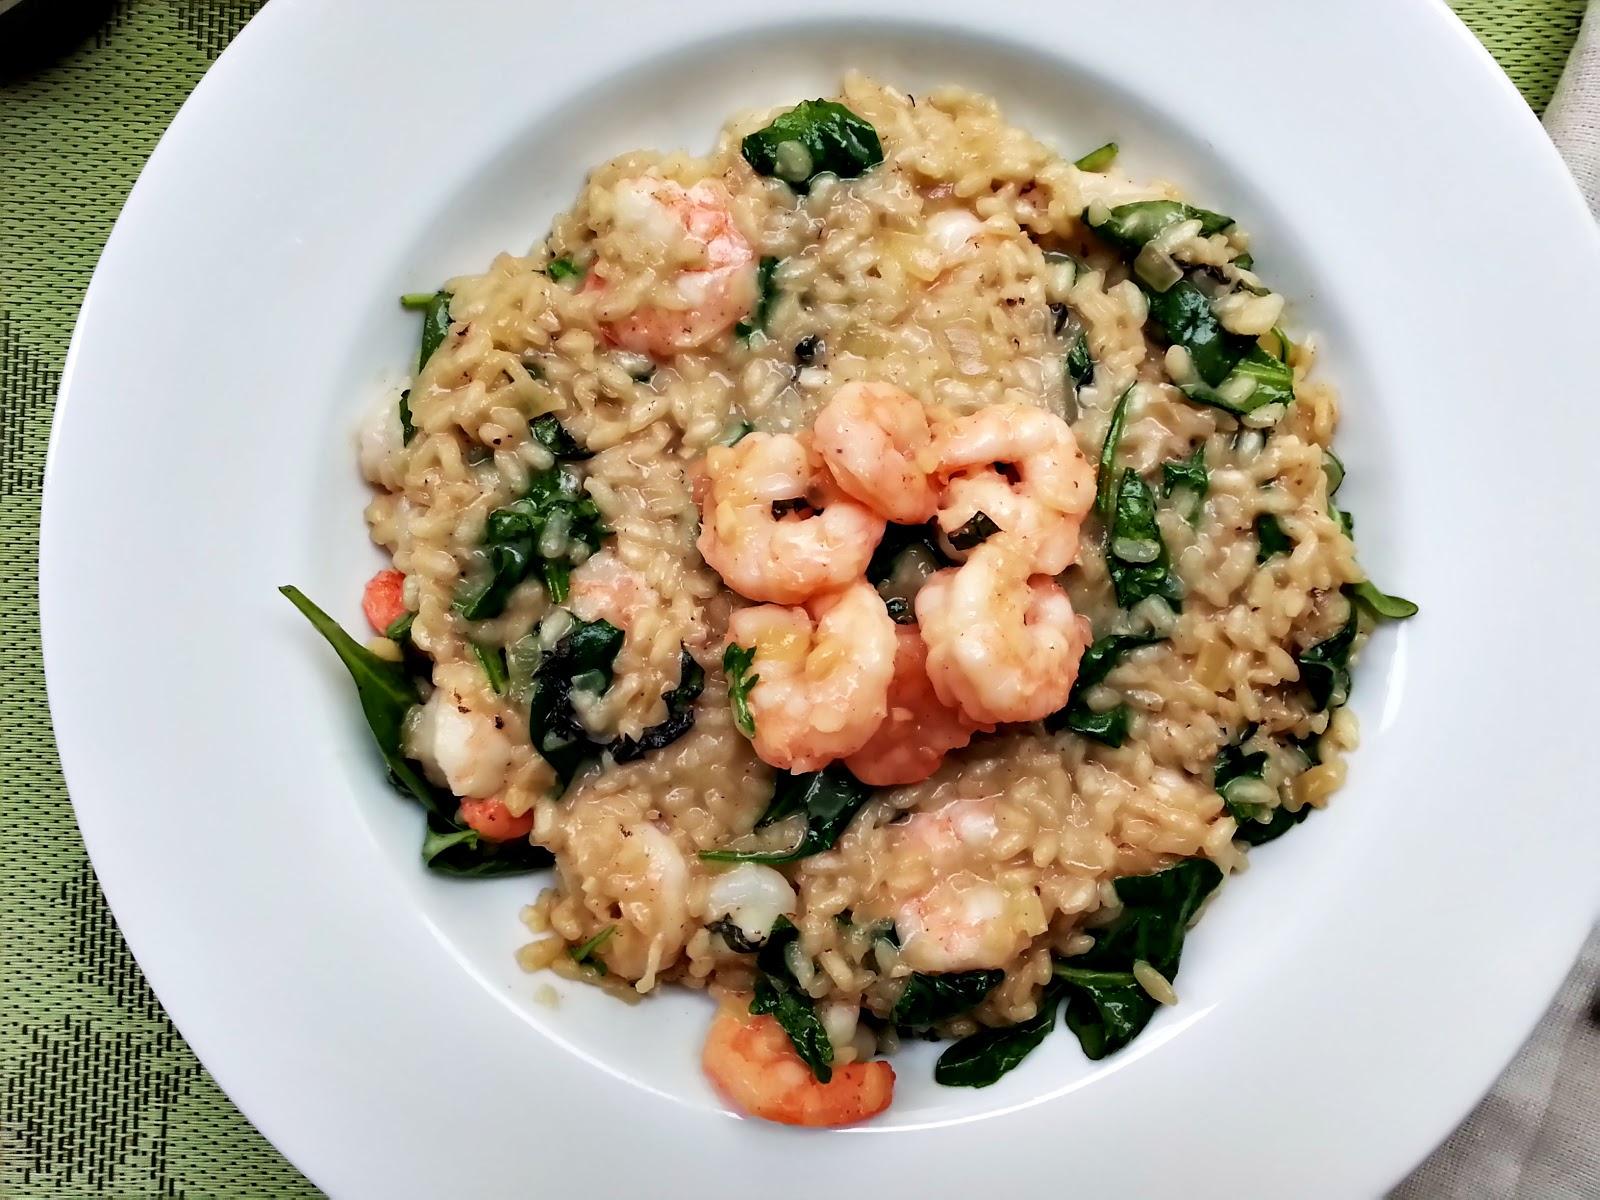 Pan seared shrimp and arugula risotto - Cherry on my Sundae